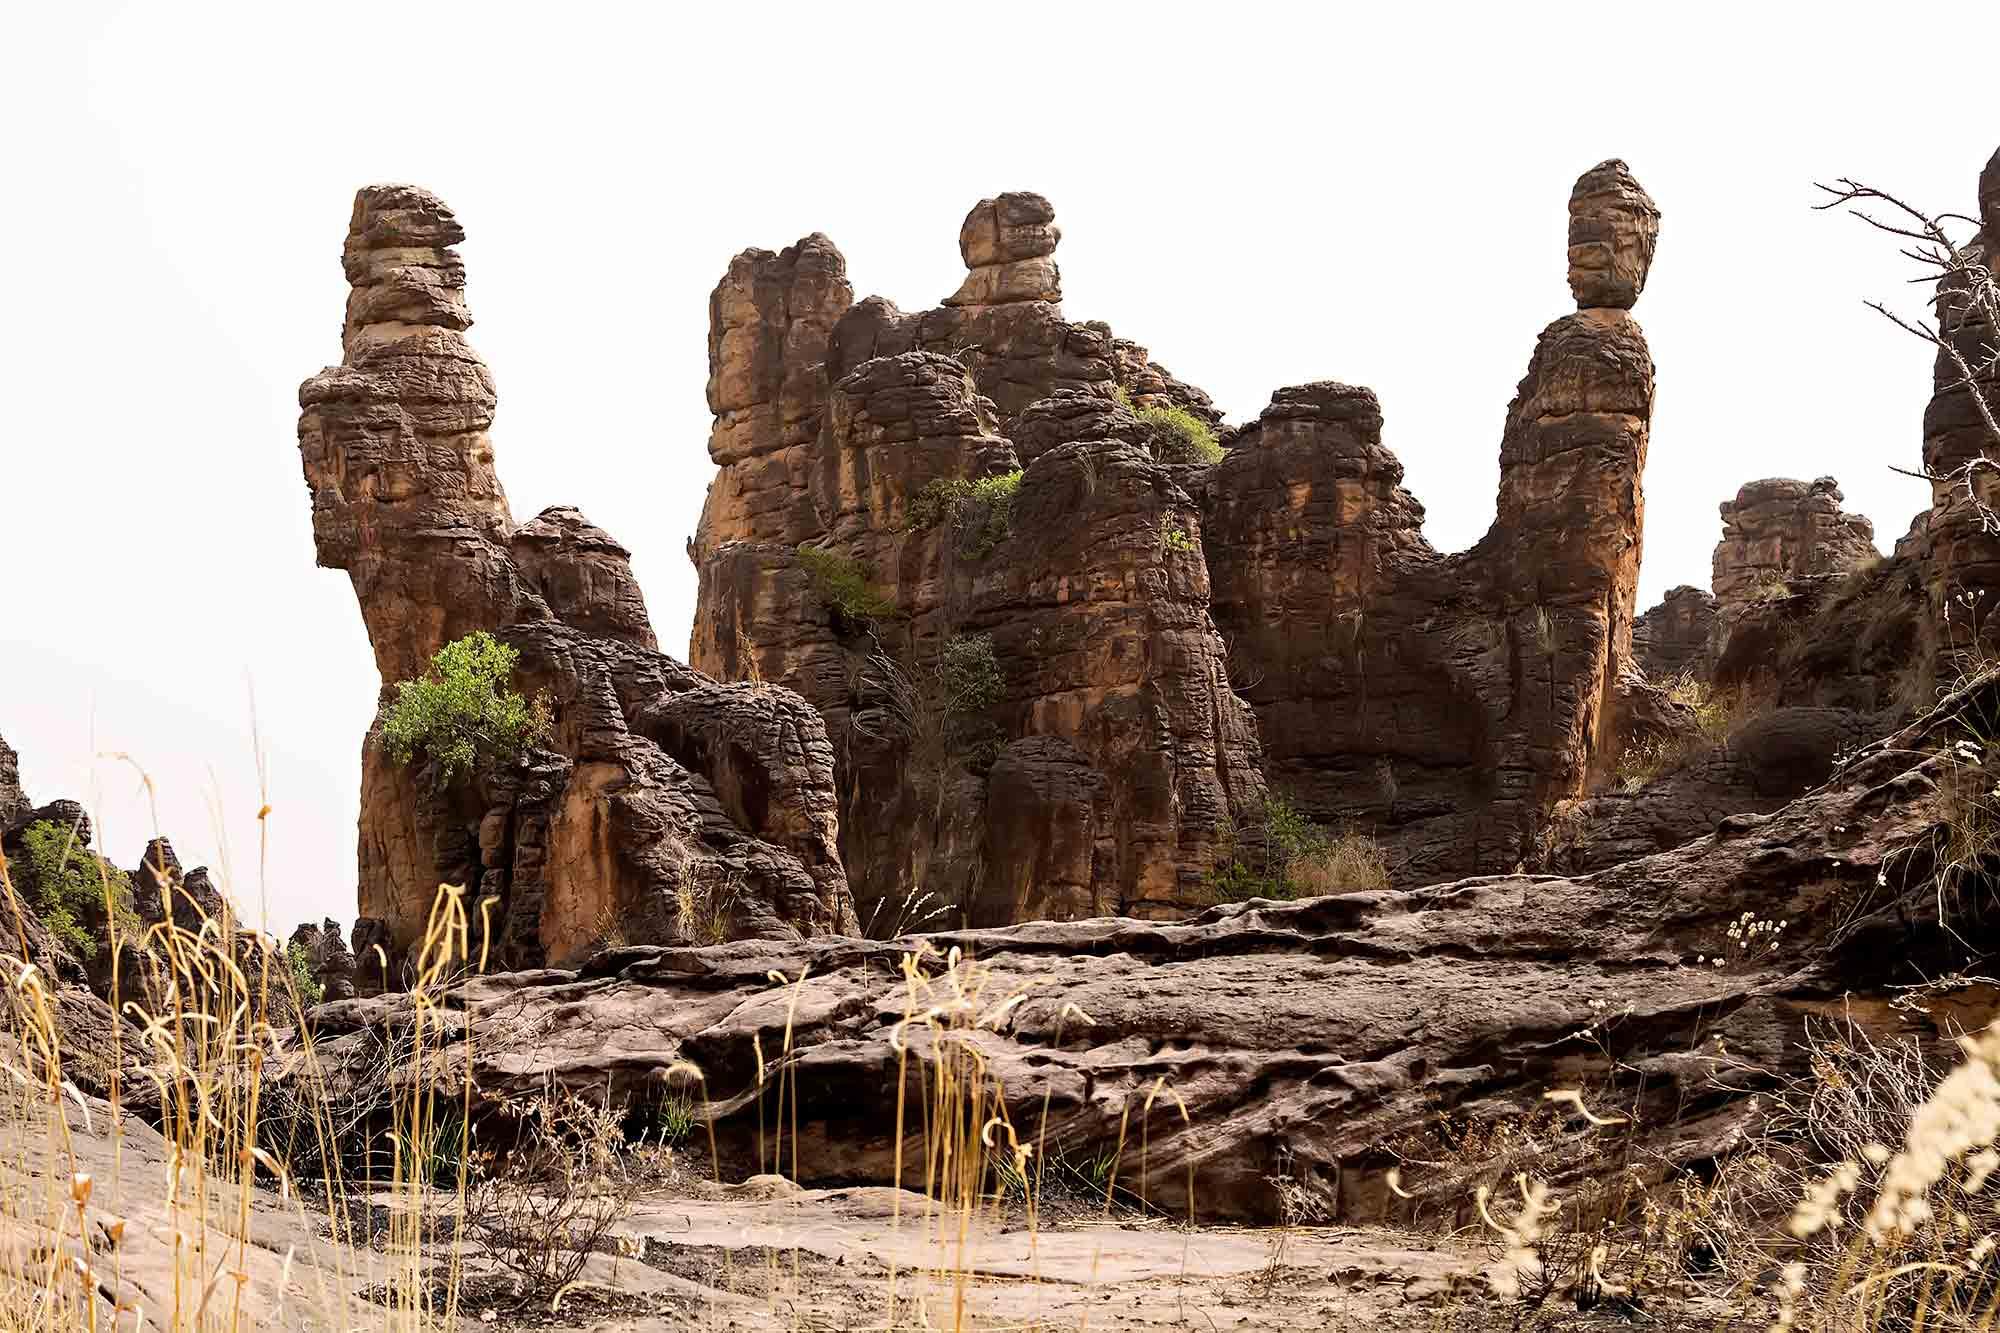 landscape-banfora-rock-formation-burkina-faso-africa